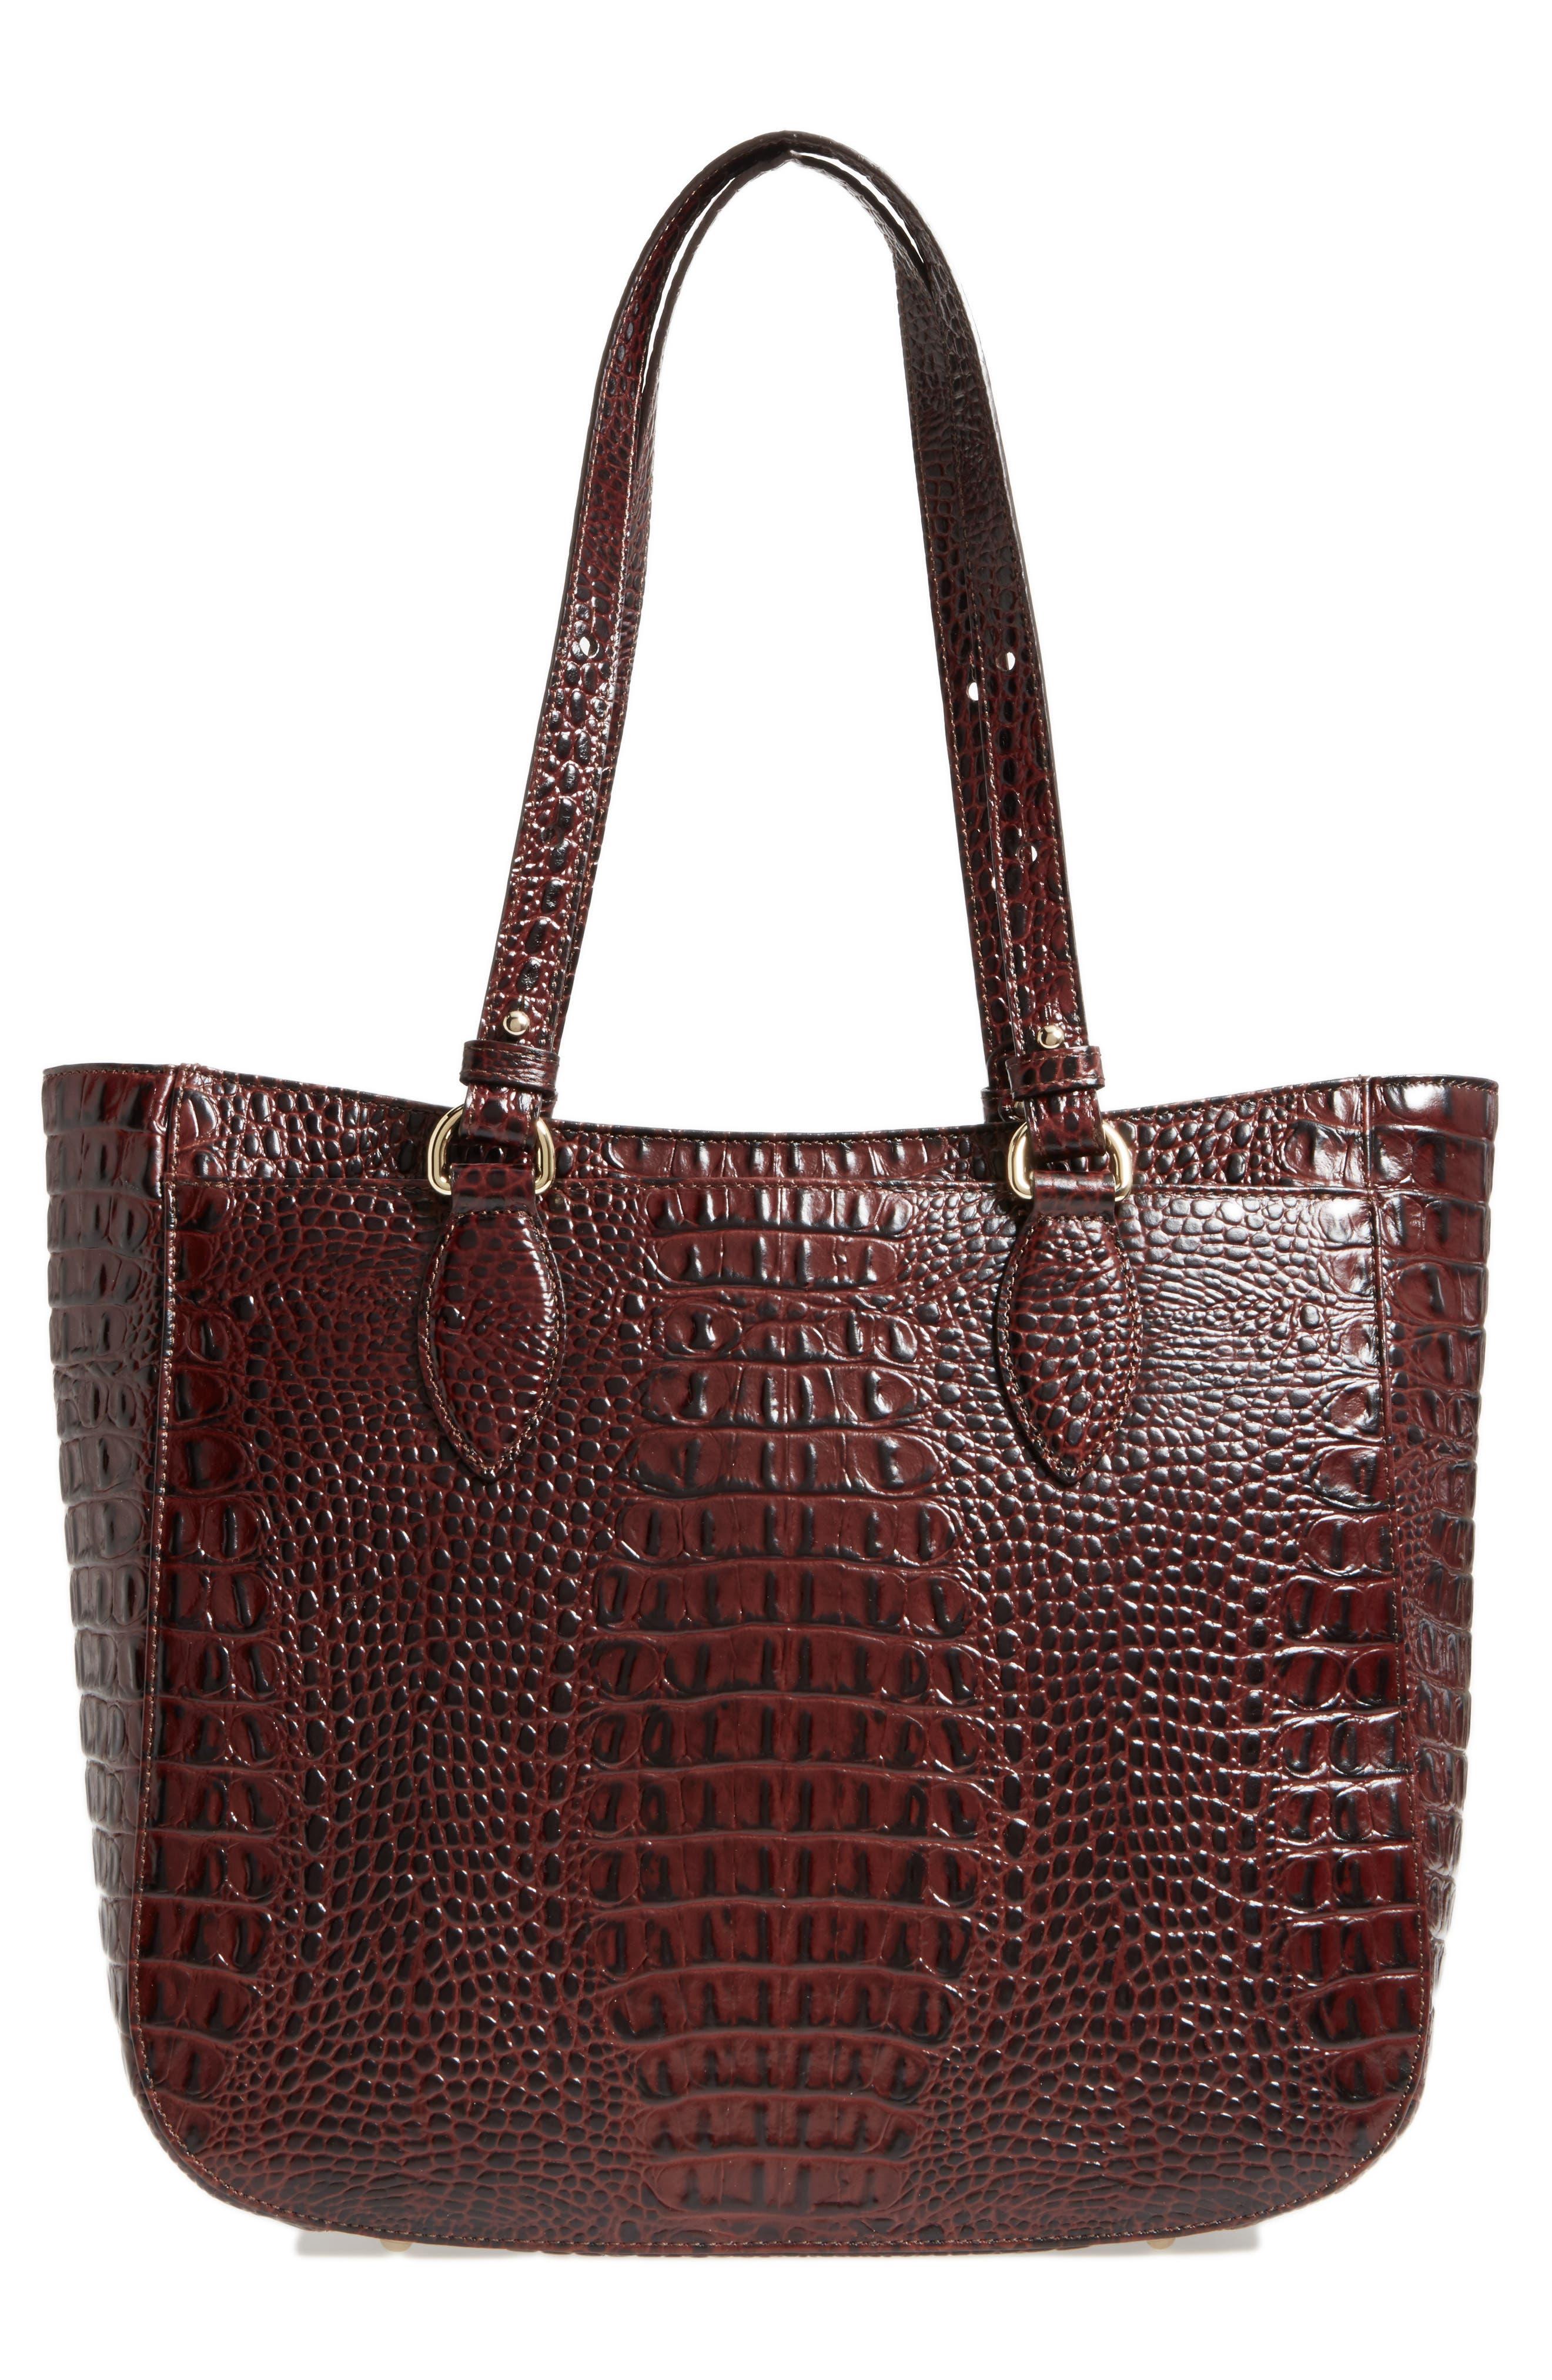 Medium Red Verona - Lena Leather Tote,                             Alternate thumbnail 3, color,                             610